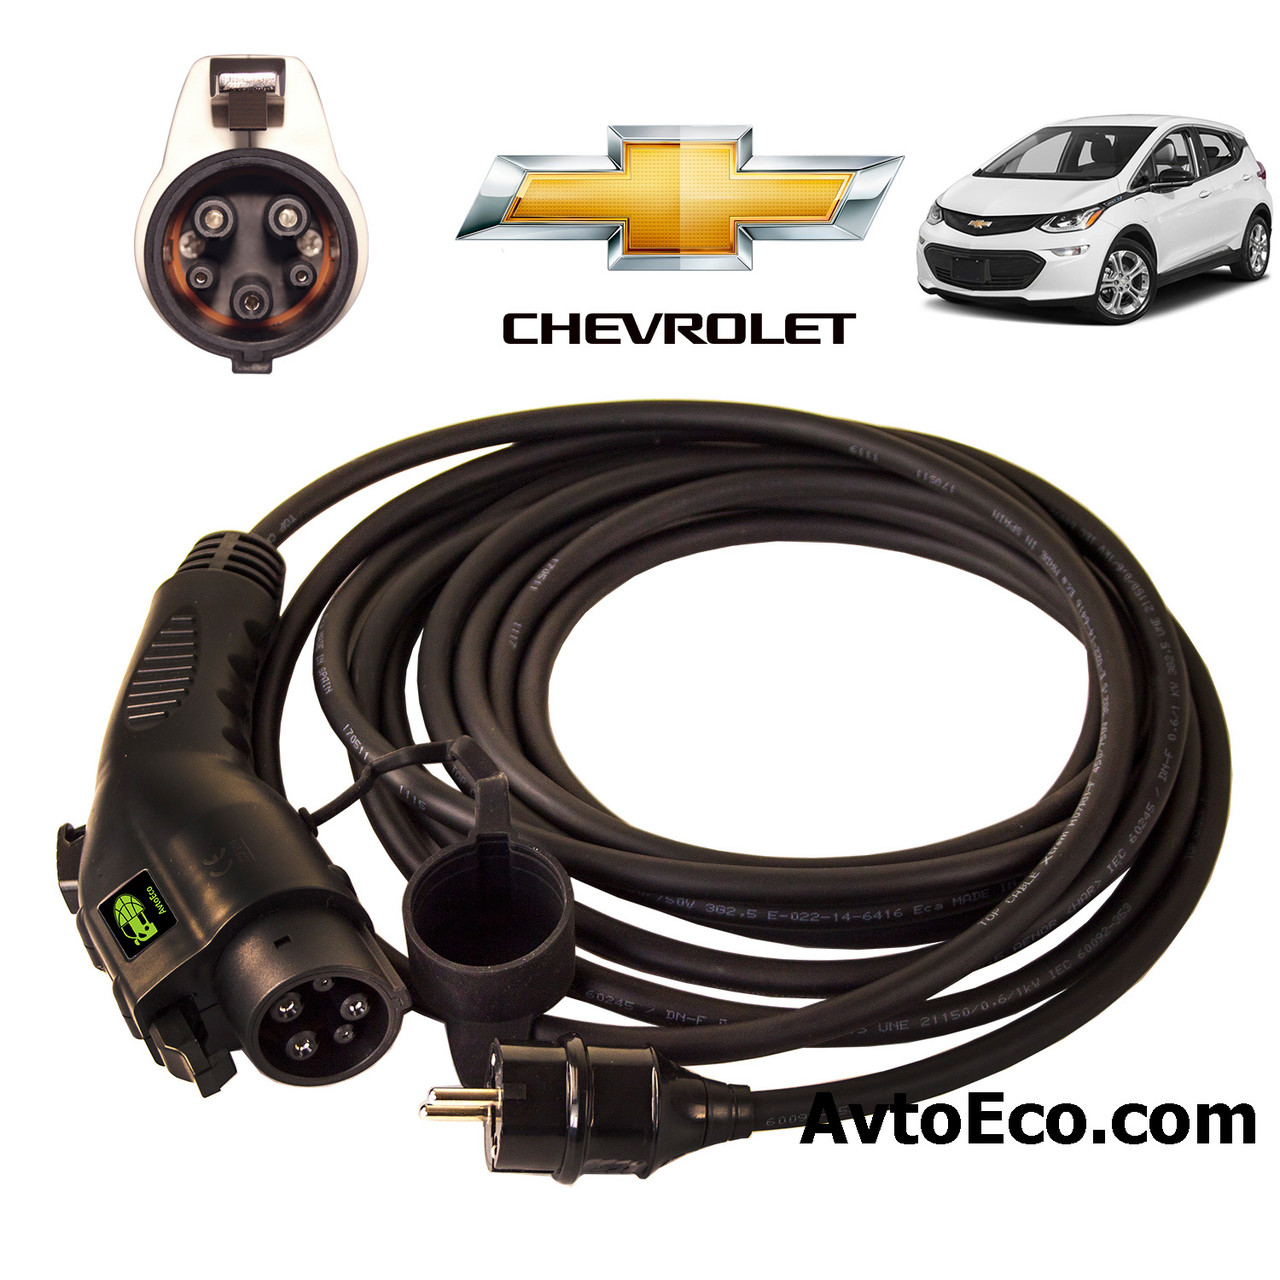 Зарядное устройство для электромобиля Chevrolet Bolt EV AutoEco J1772-16A